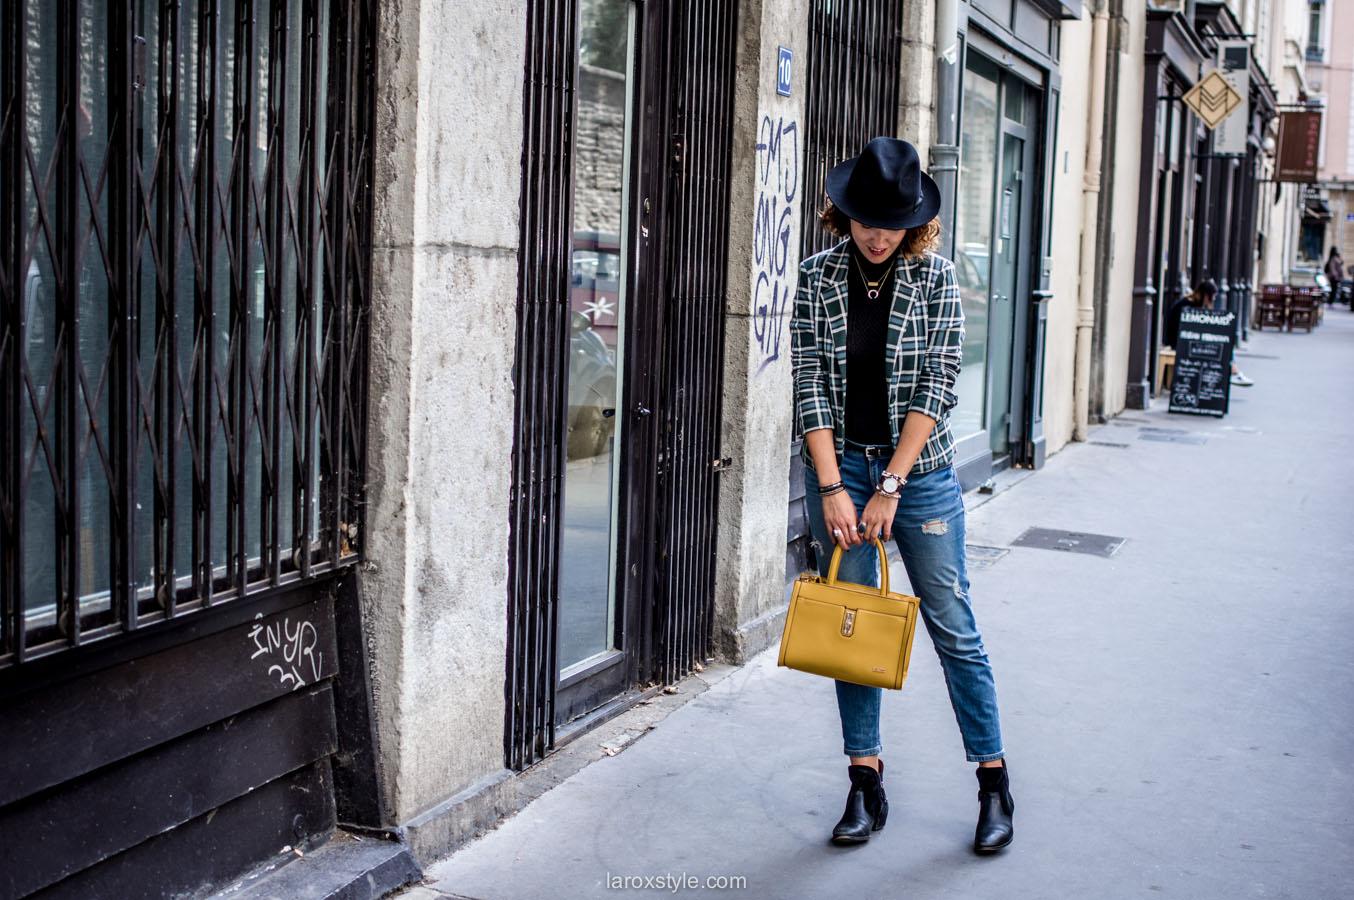 porter le motif tartan - british style - laroxstyle blog mode lyon